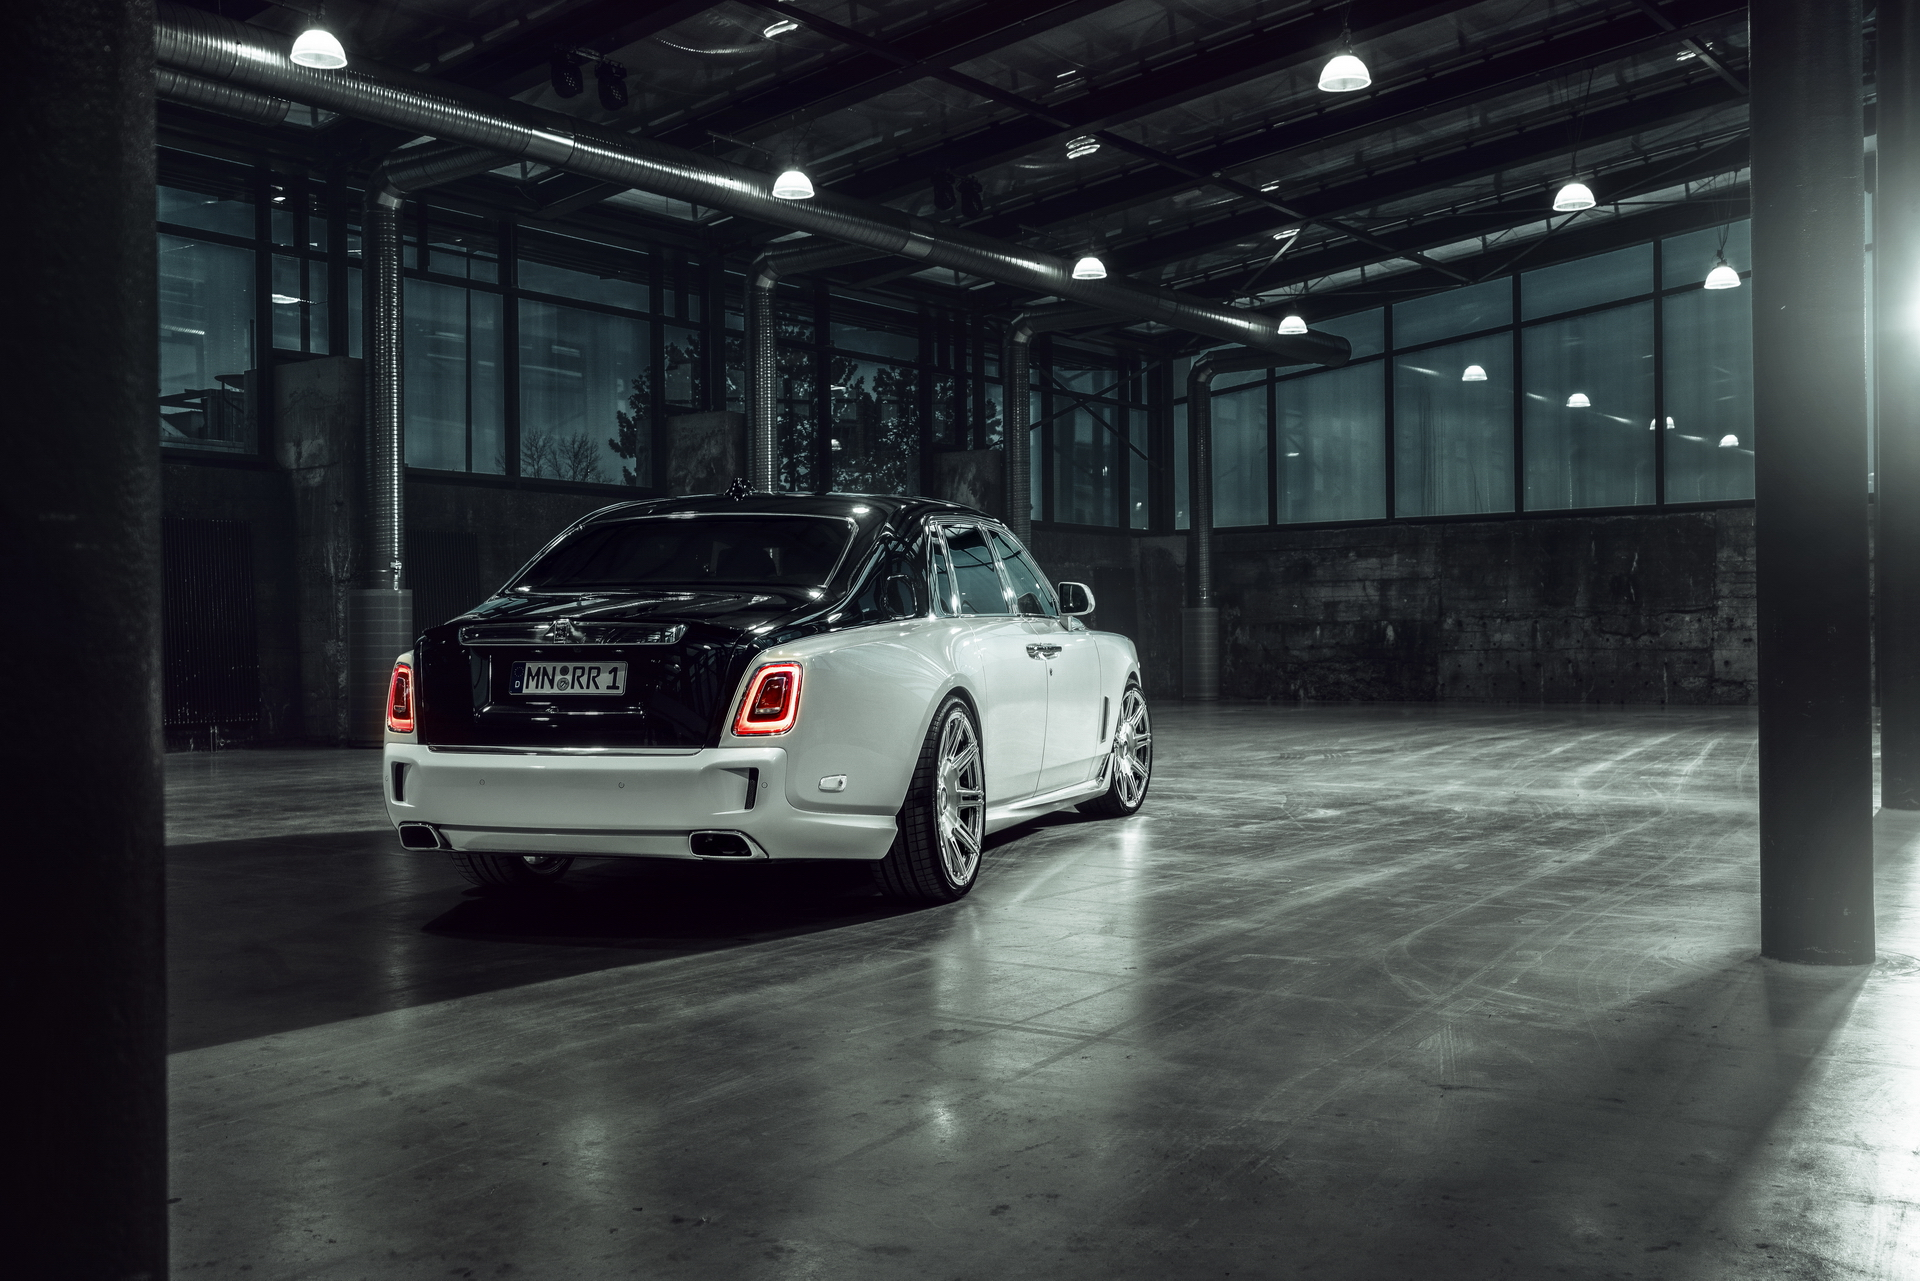 Rolls-Royce Phantom 8 Rear